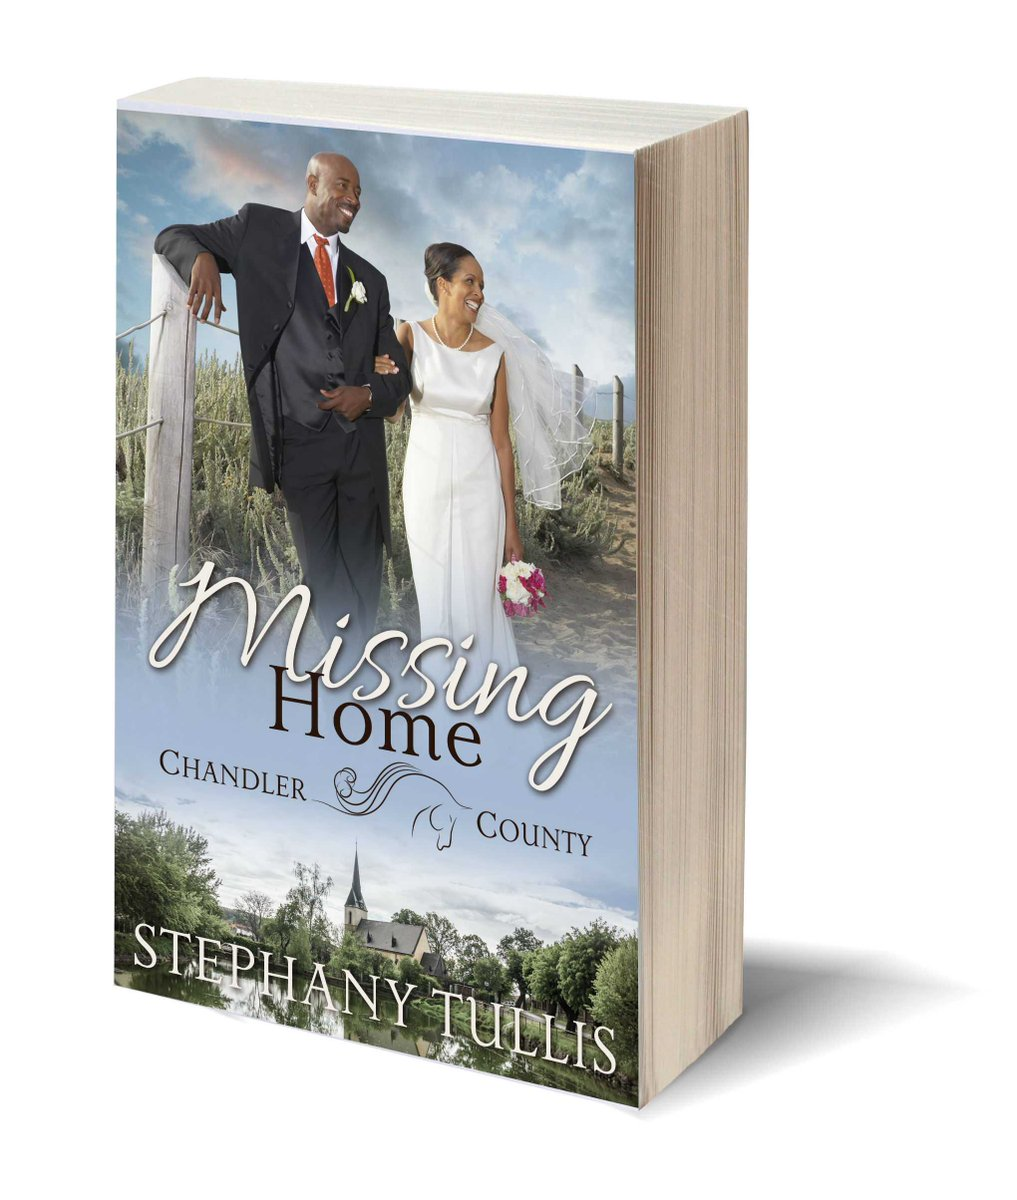 All things happen for a reason!  http:// getbook.at/MissingHome  &nbsp;     http:// wp.me/P5rIsN-2Tj  &nbsp;   @StephanyTullis #romance #ASMSG #fridayreads <br>http://pic.twitter.com/Q0ElX74aCv